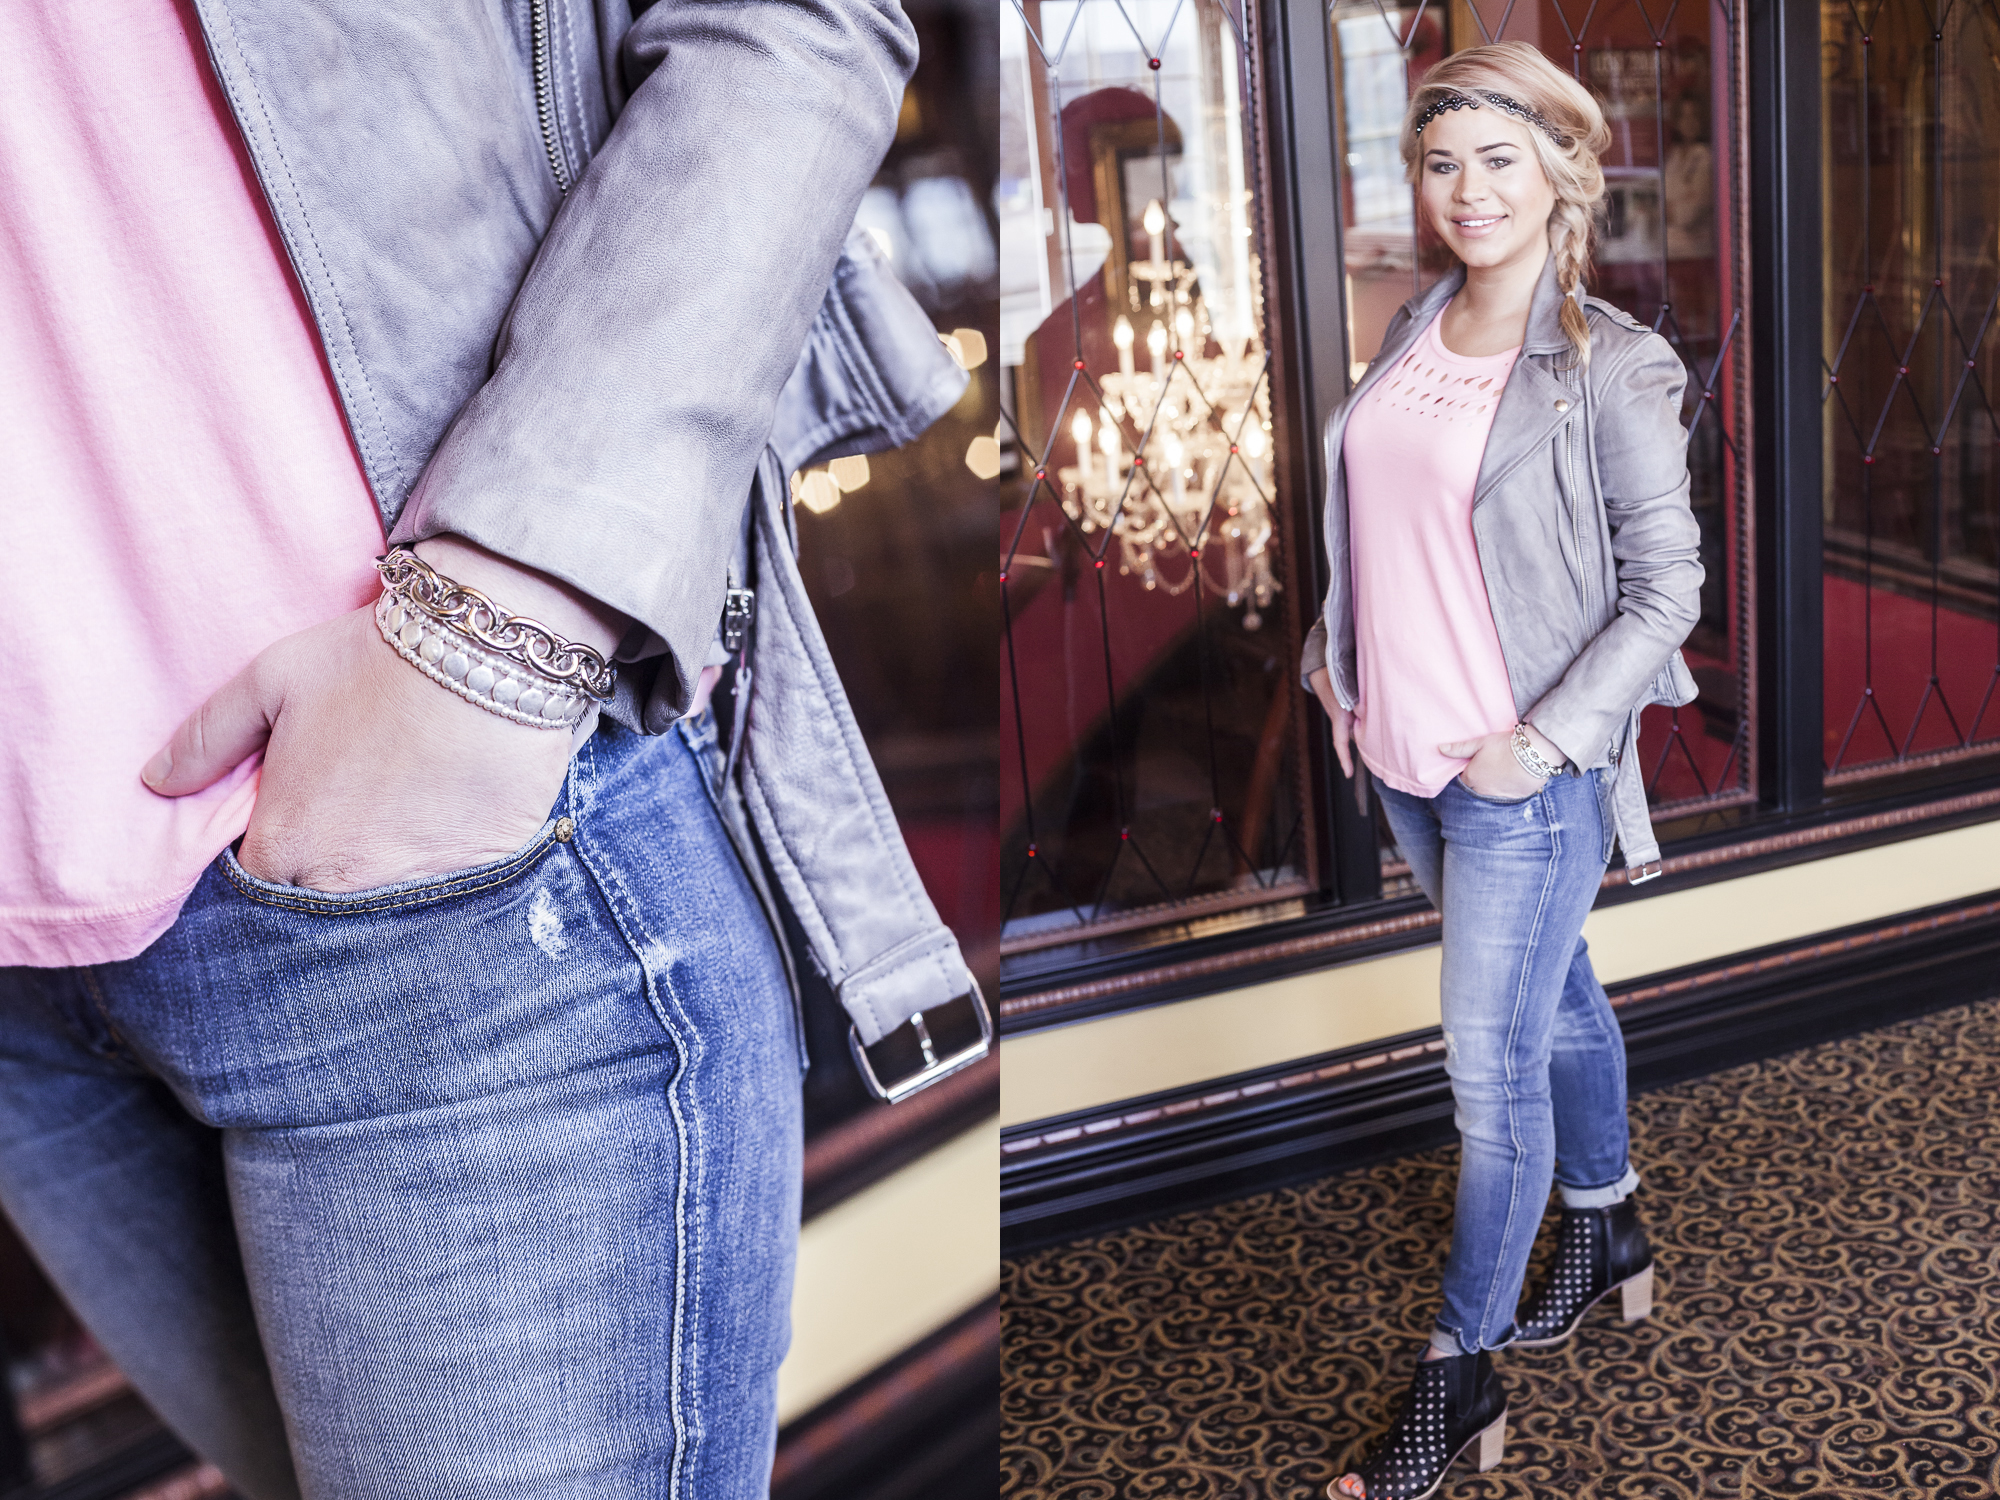 edmonton-shopping-fashion-boutique-spring-styles-2015-bella-maas-boutique